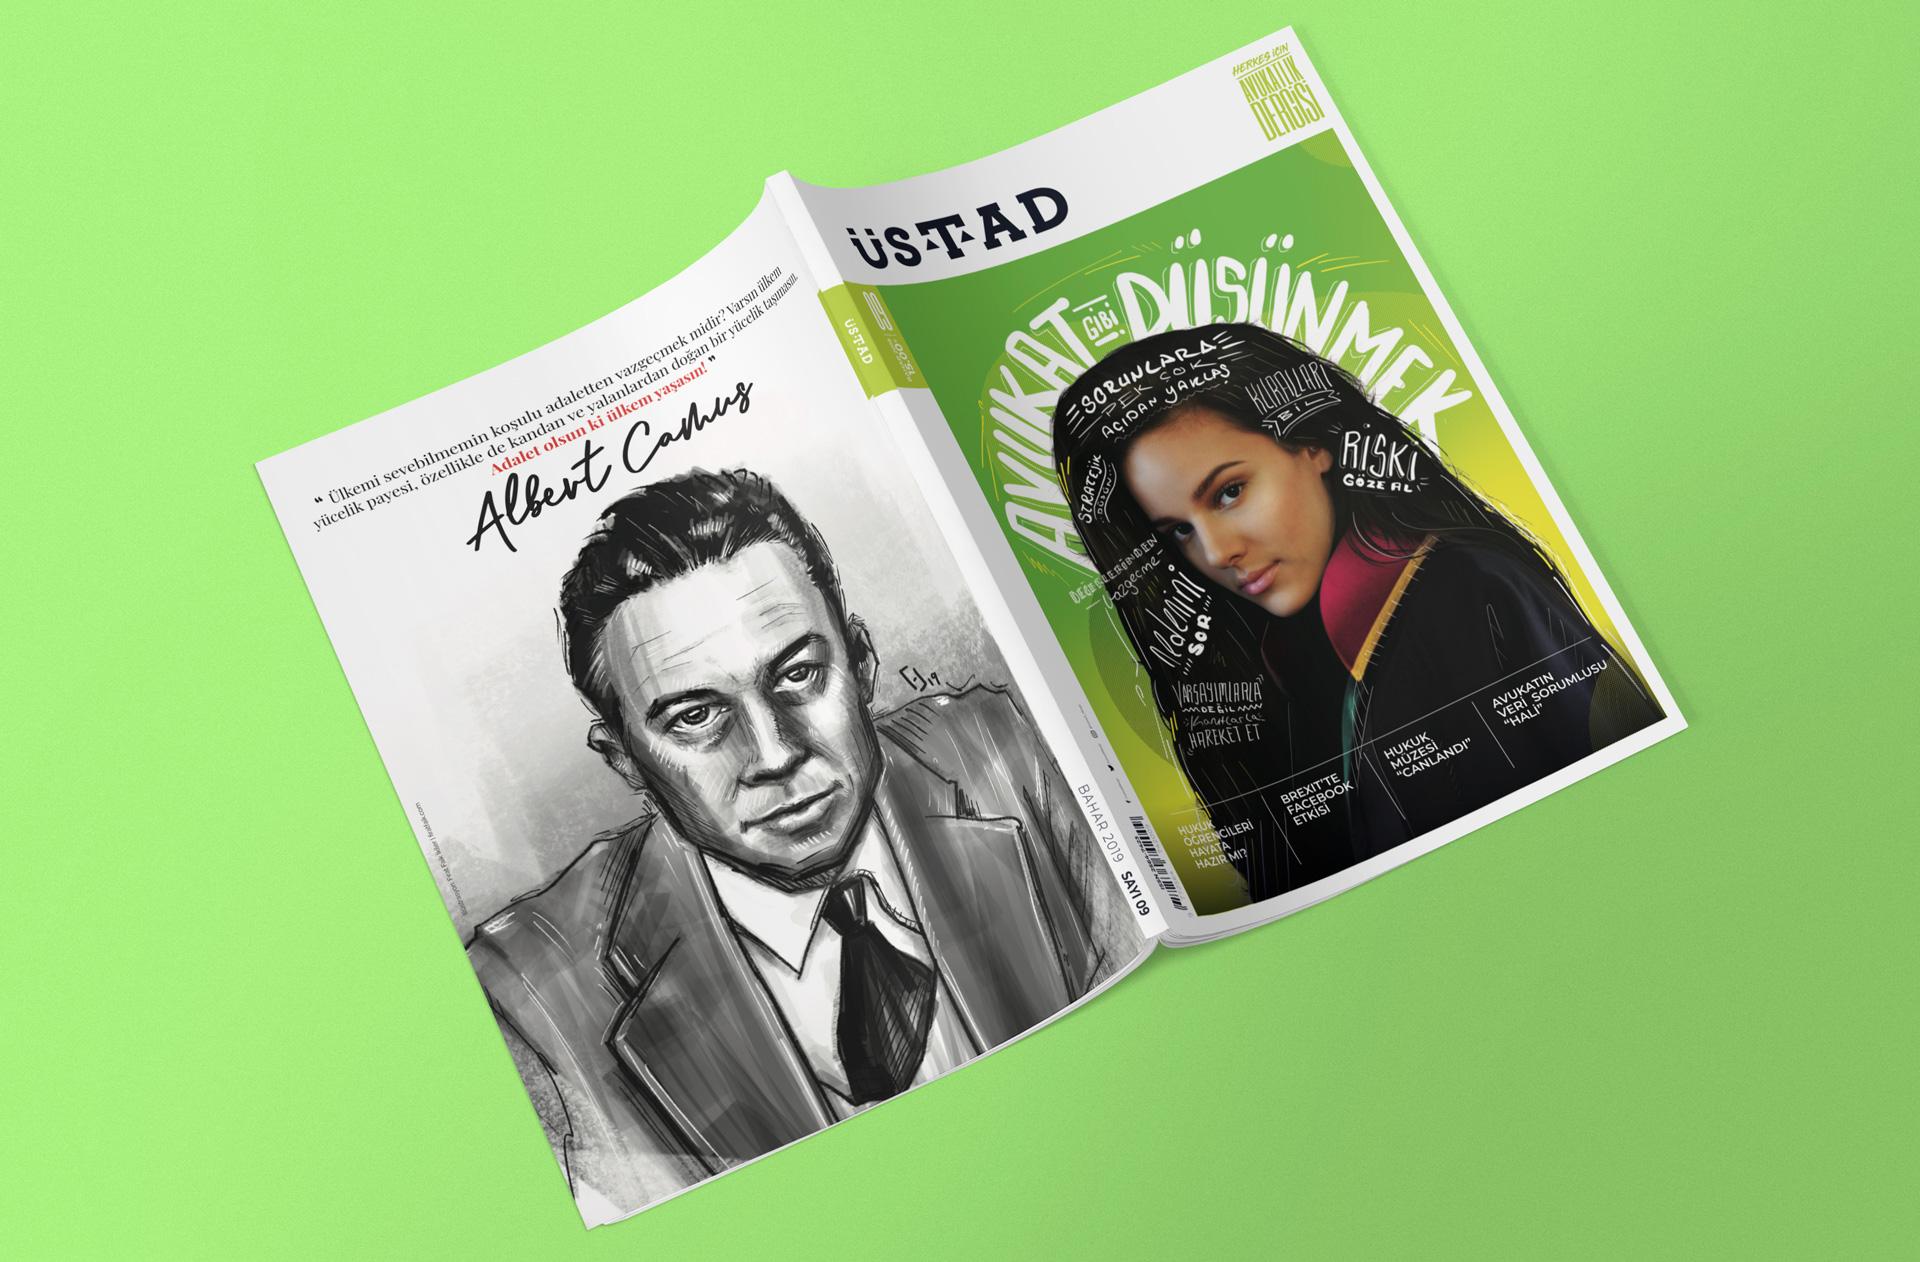 9th issue of Ustad Magazine